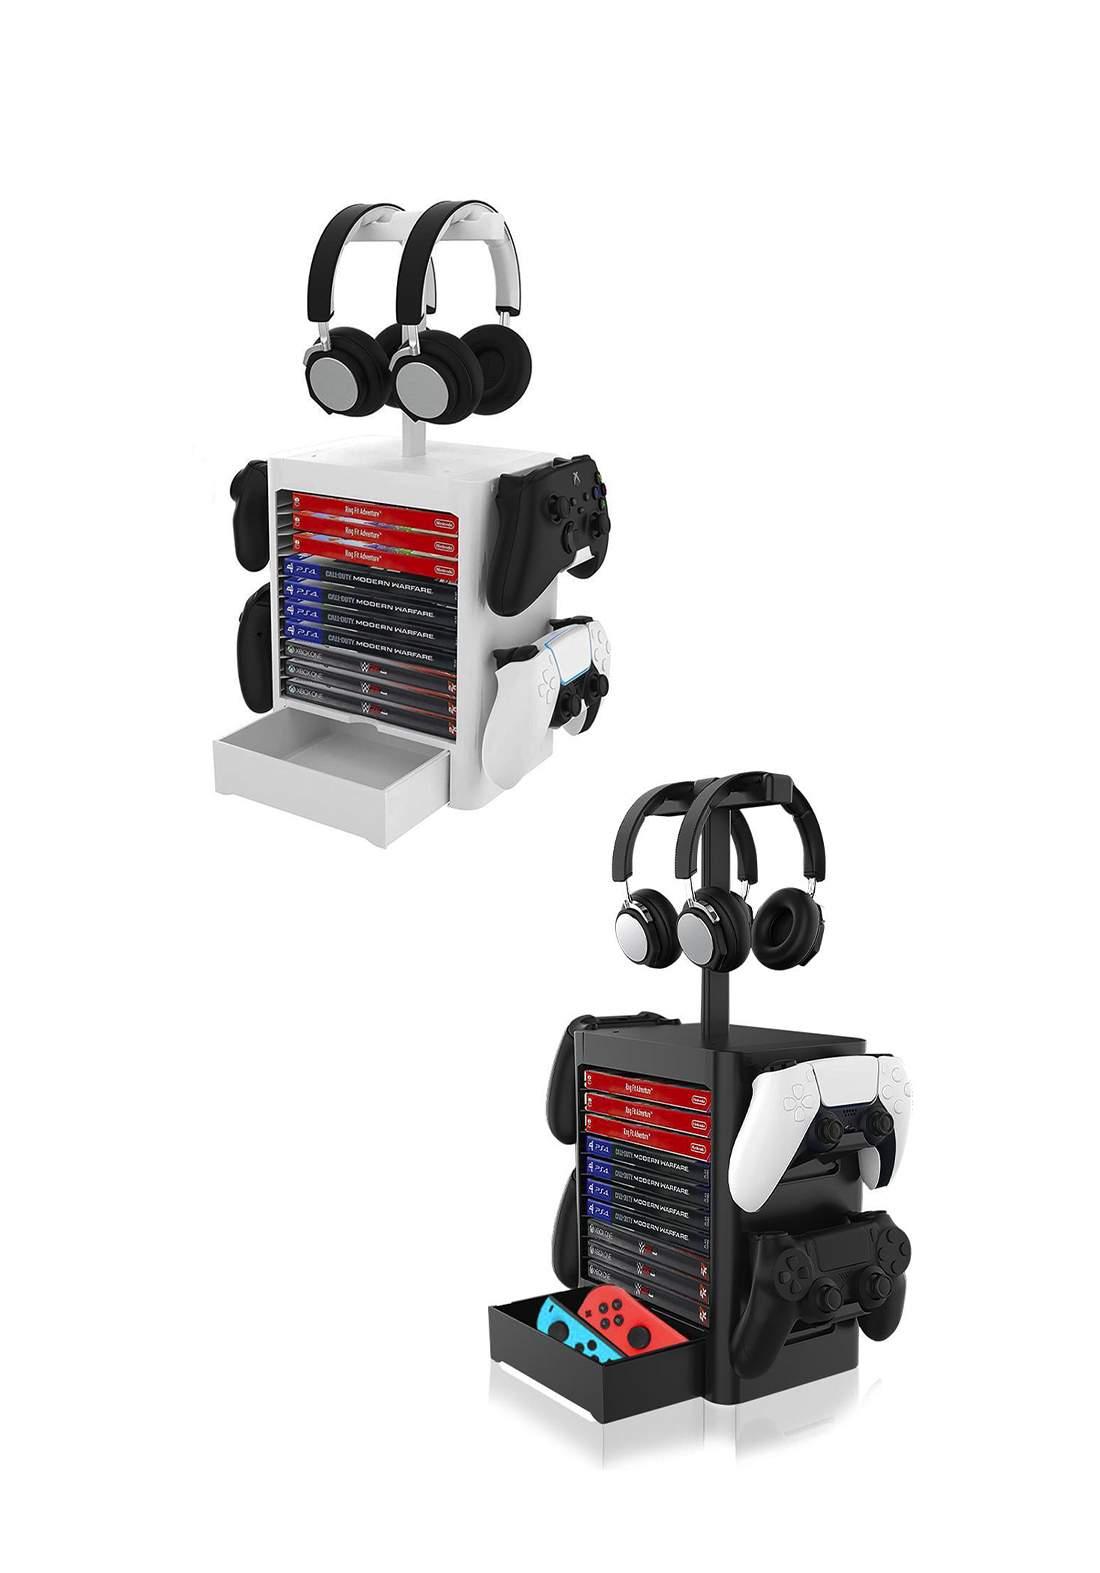 Multifunctional Game Storage Tower برج تخزين الألعاب